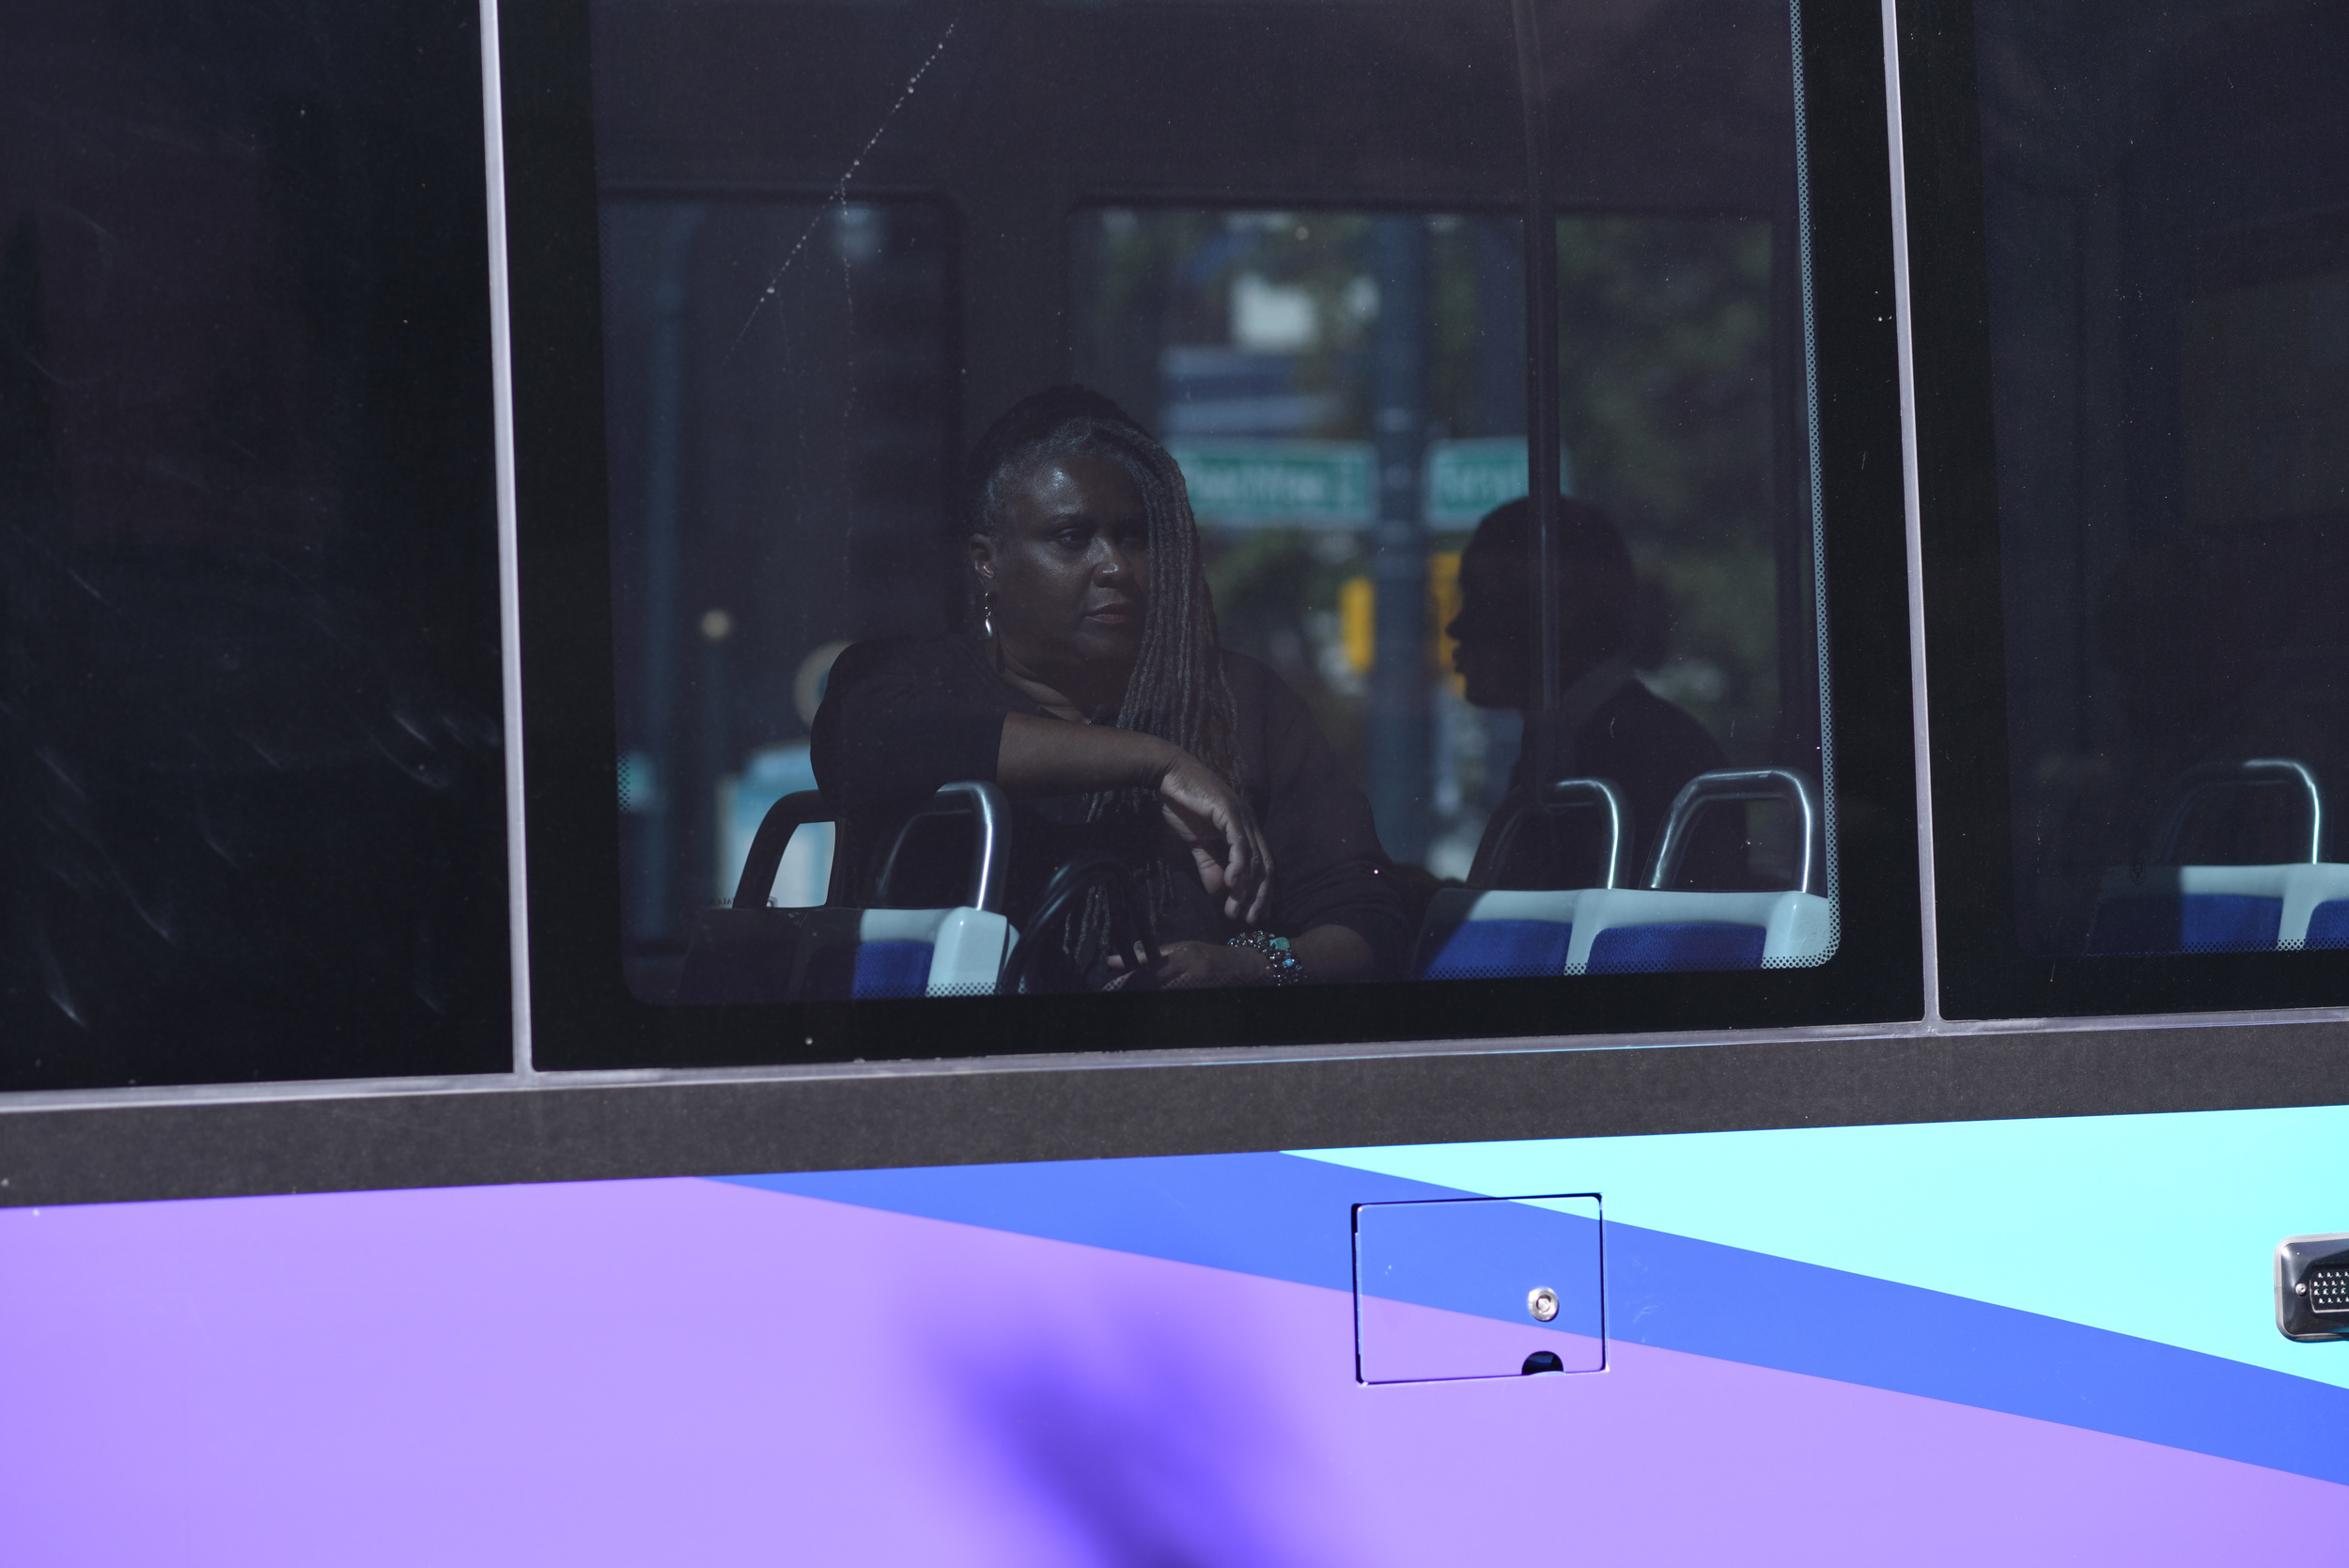 lady-on-bus.jpg